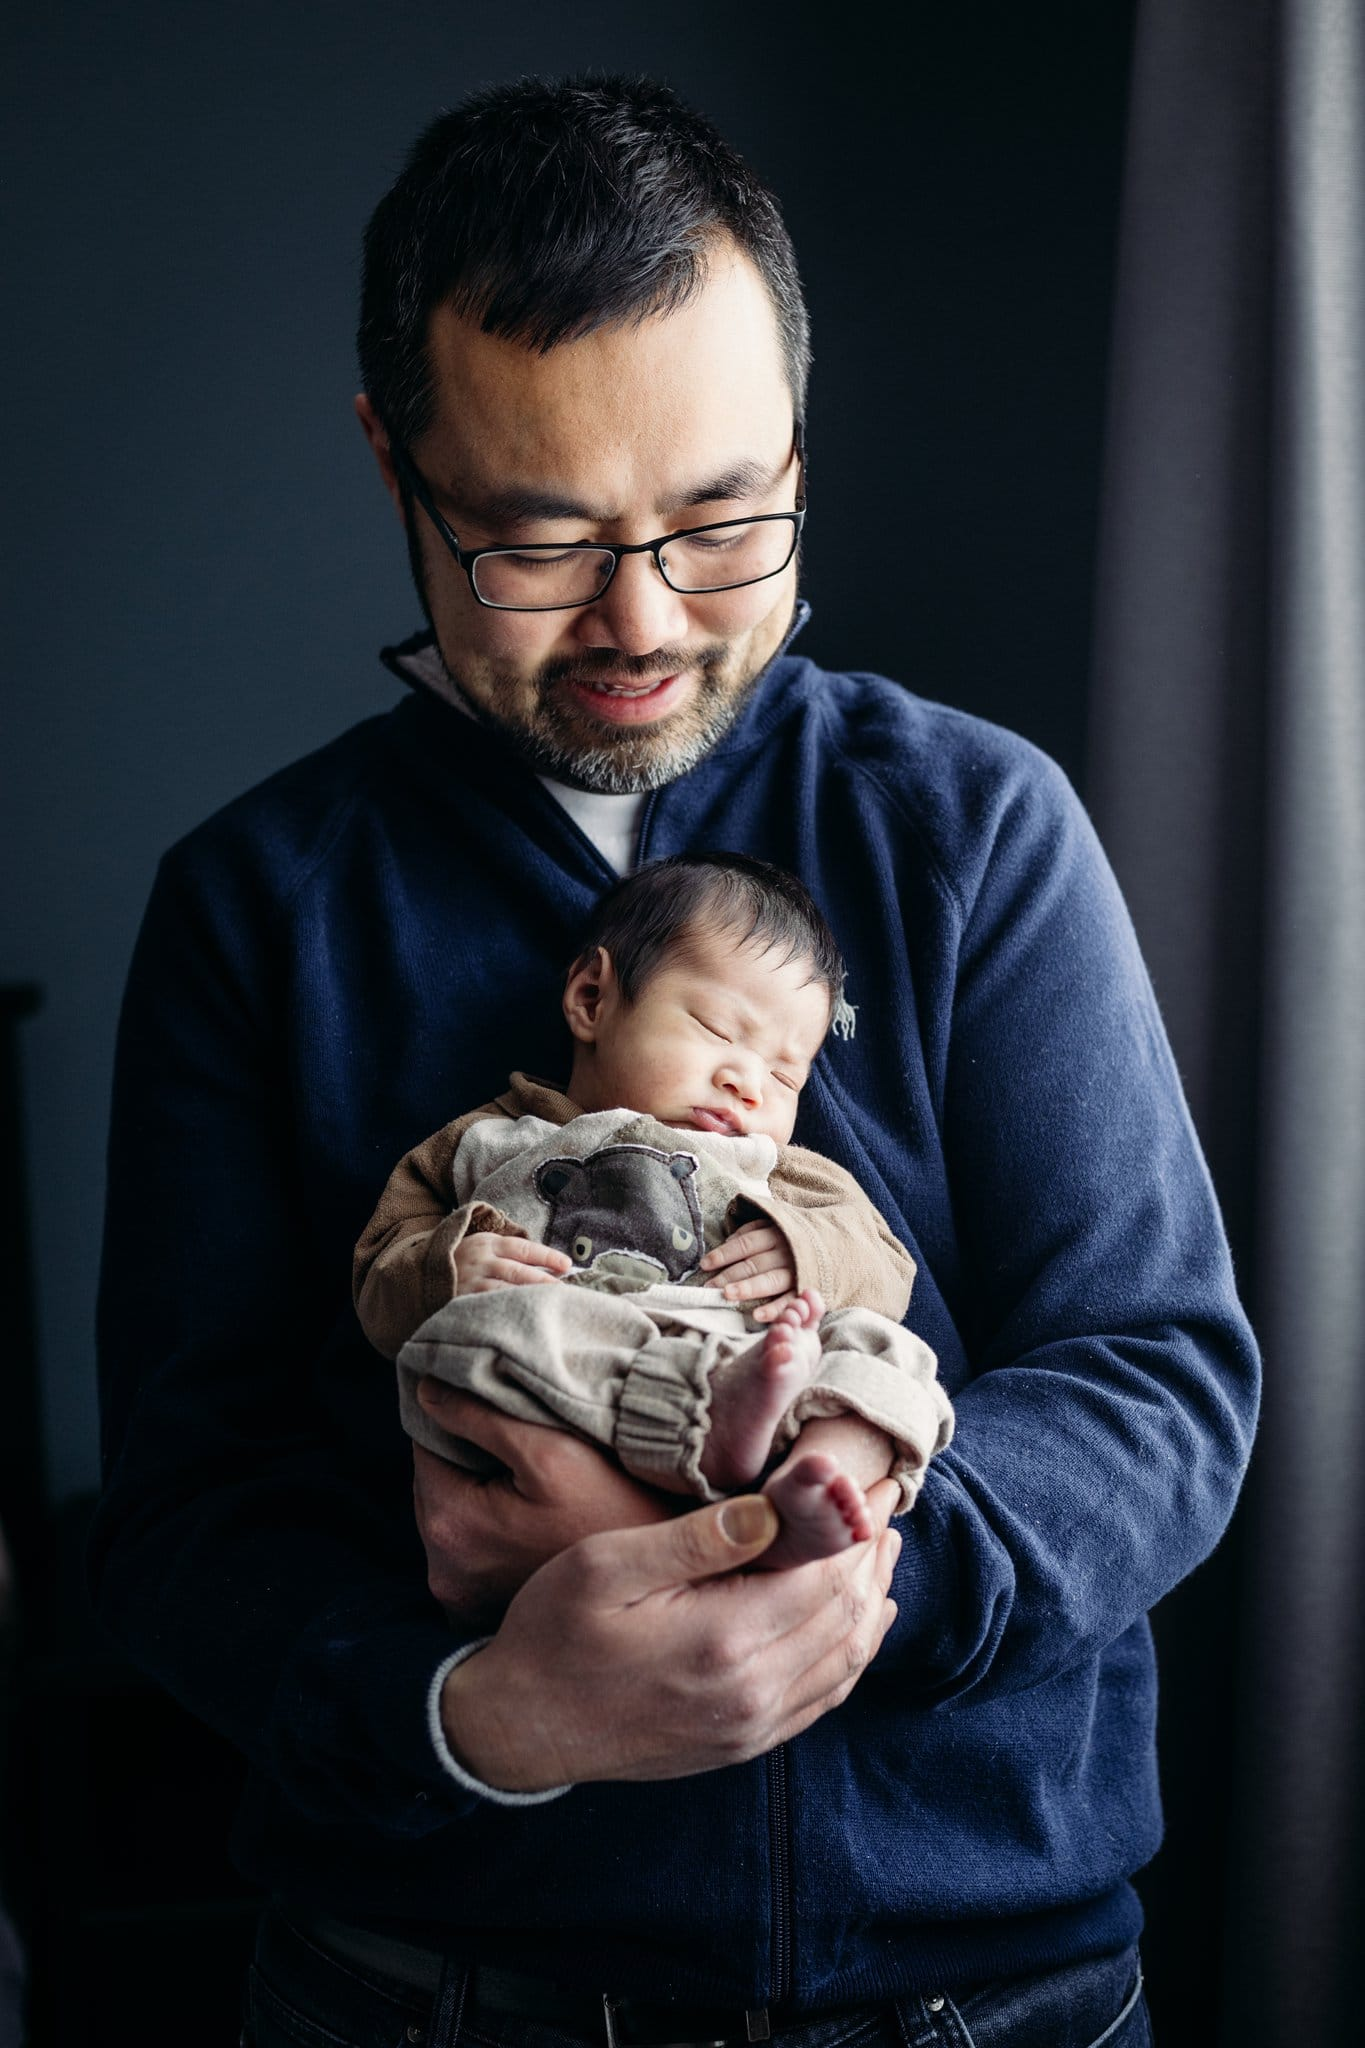 Ashley Daphne Photography Calgary Family Photographer Newborn Lifestyle Photos_0067.jpg